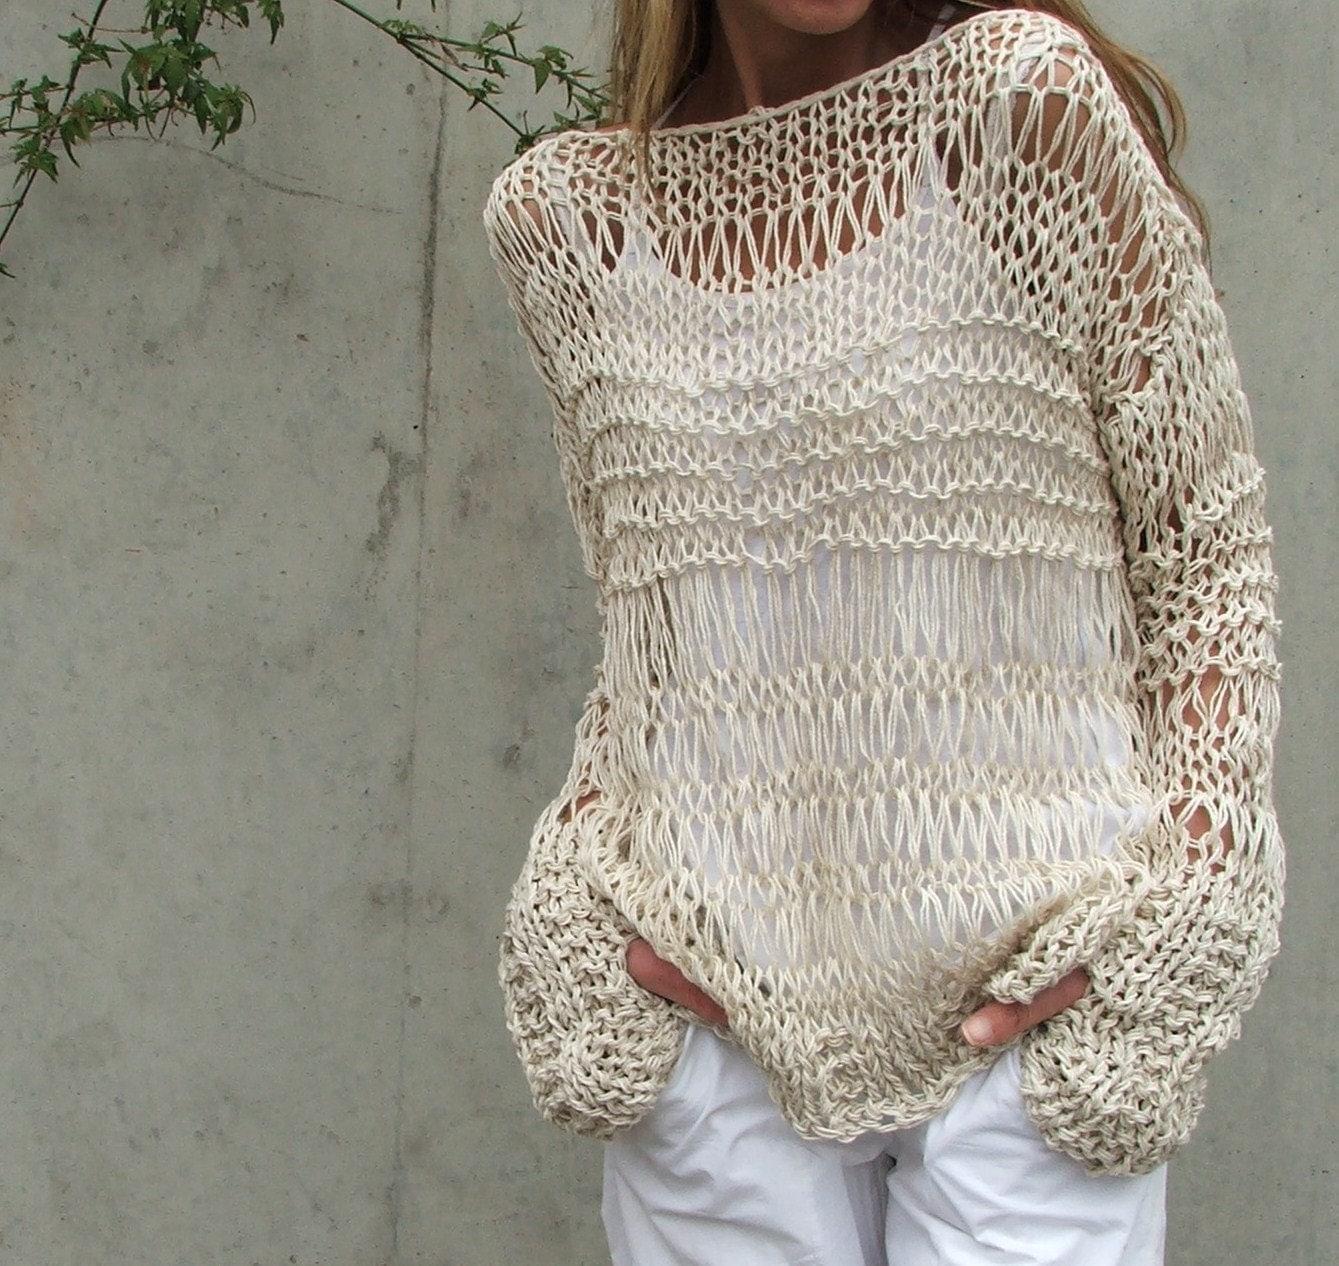 Knitting Summer Sweater : Chandeliers pendant lights